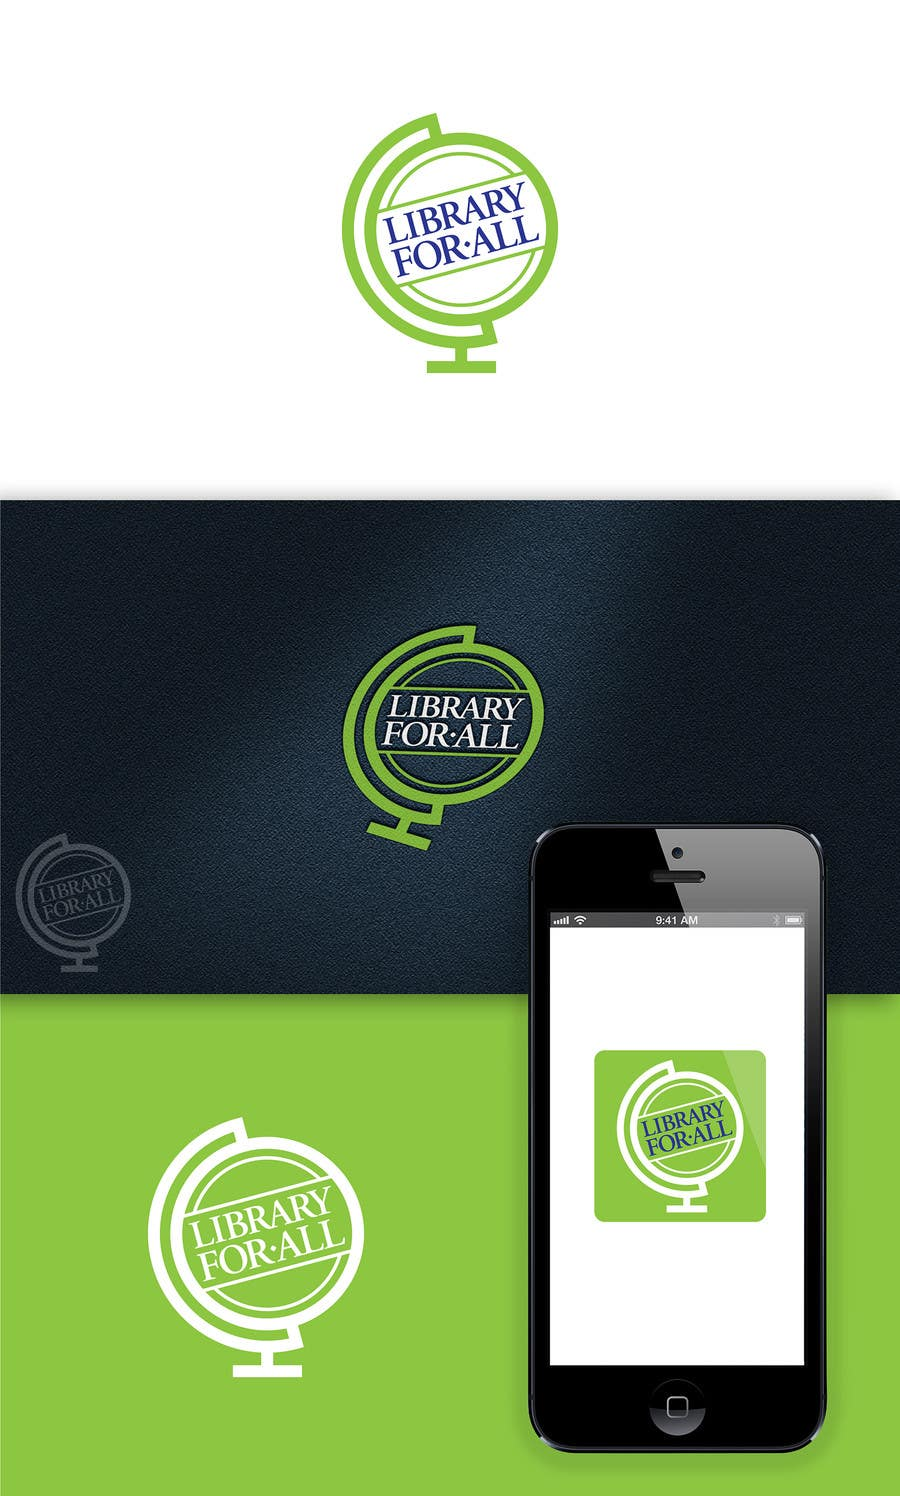 Penyertaan Peraduan #330 untuk Design a Logo for the Library For All application!